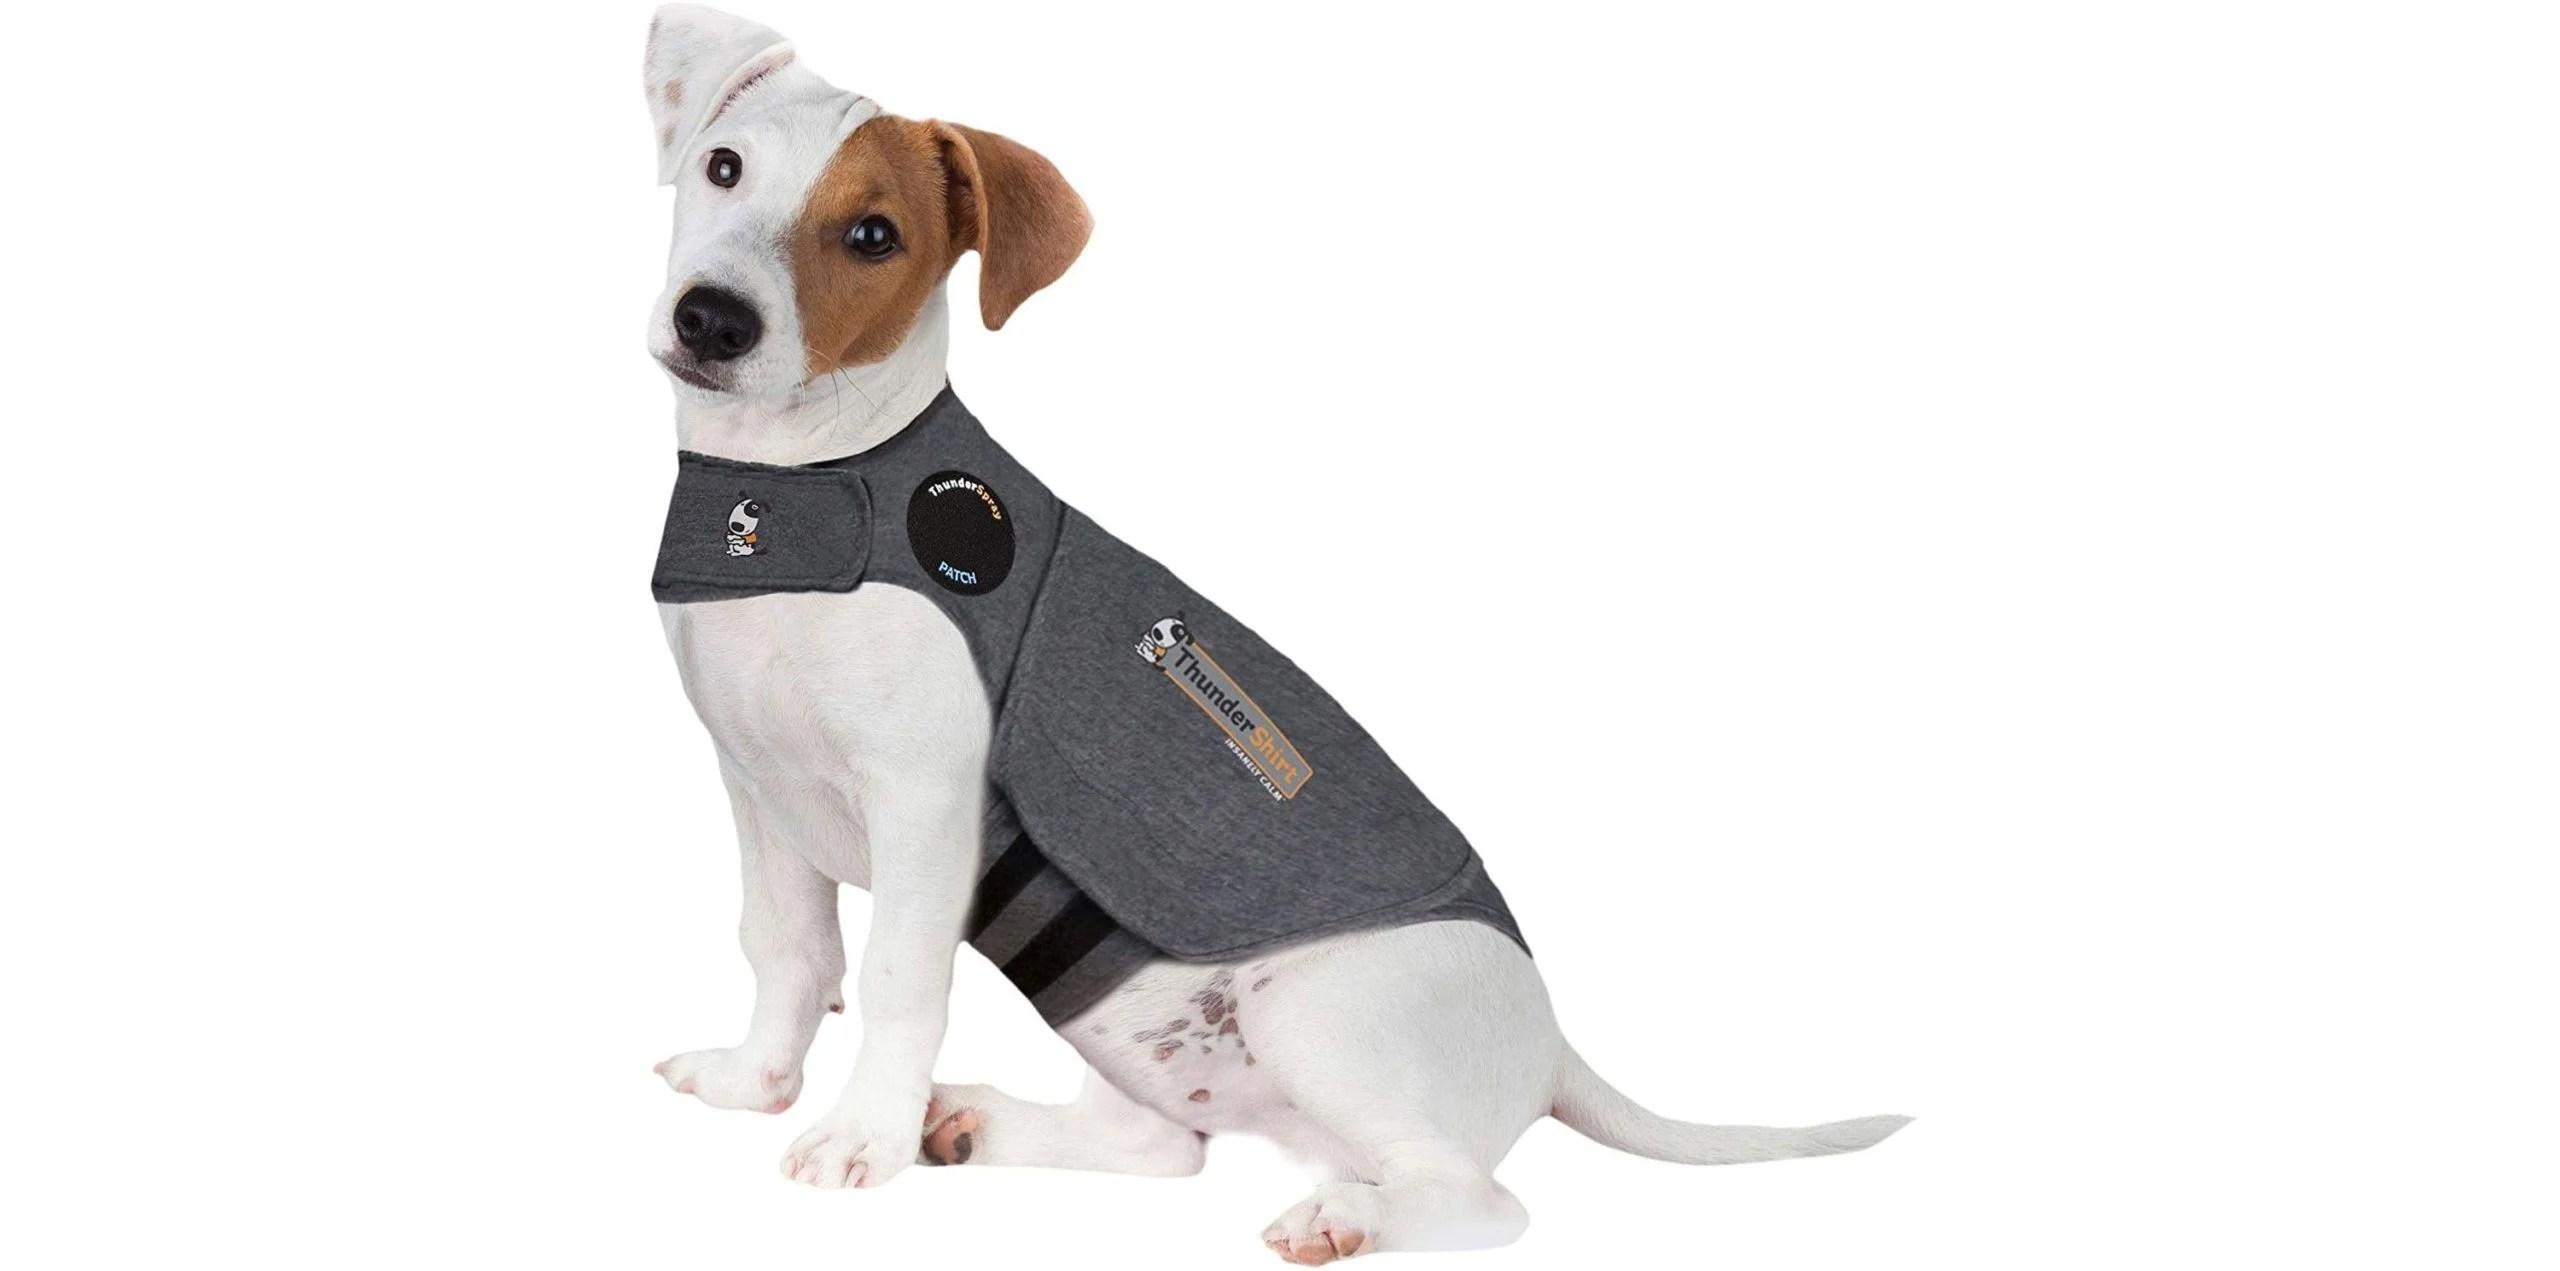 ThunderShirt camiseta para ansiedad en perros - opiniones